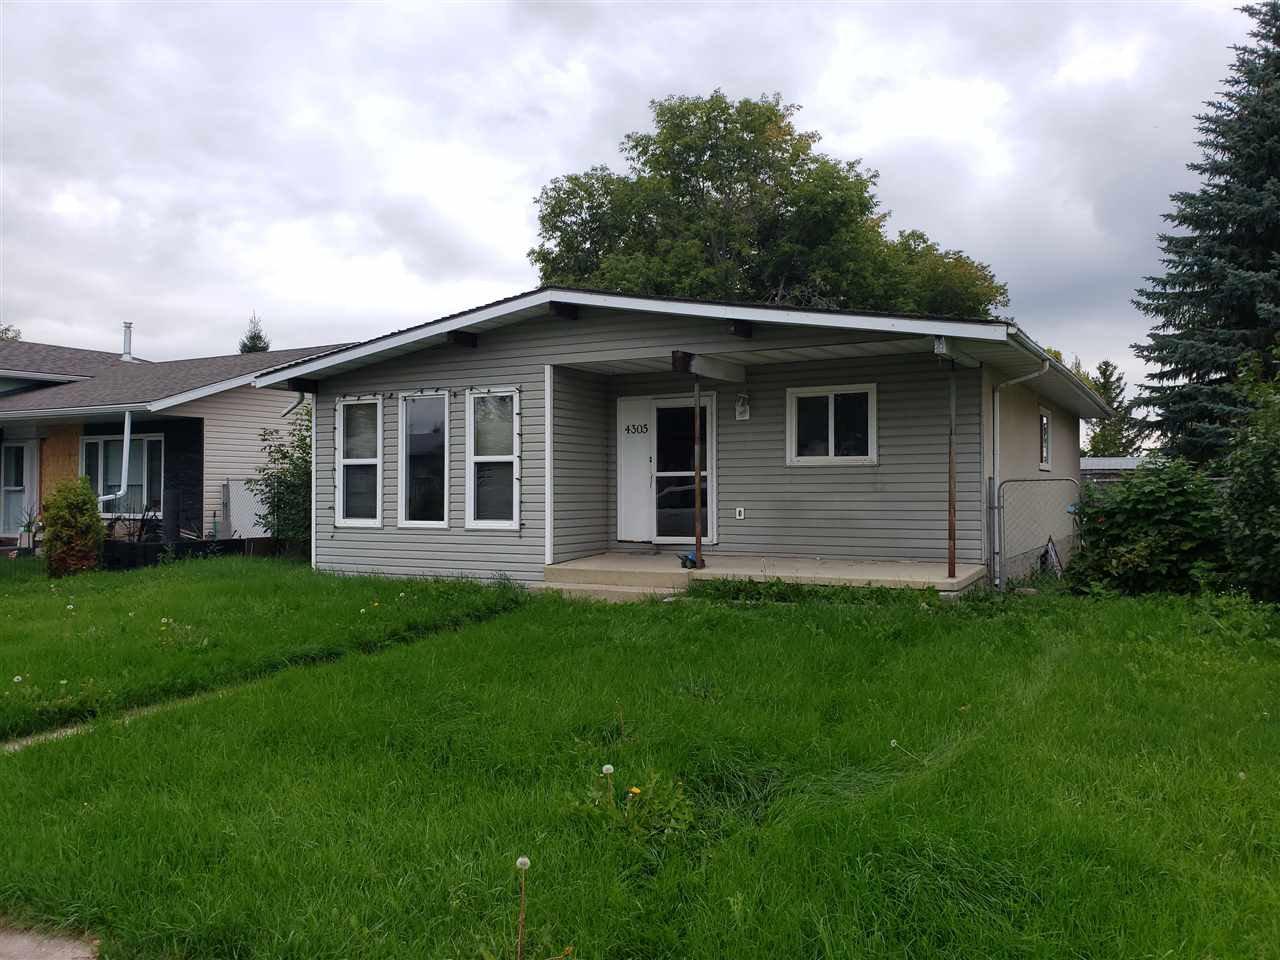 Main Photo: 4305 40 Avenue: Stony Plain House for sale : MLS®# E4170231